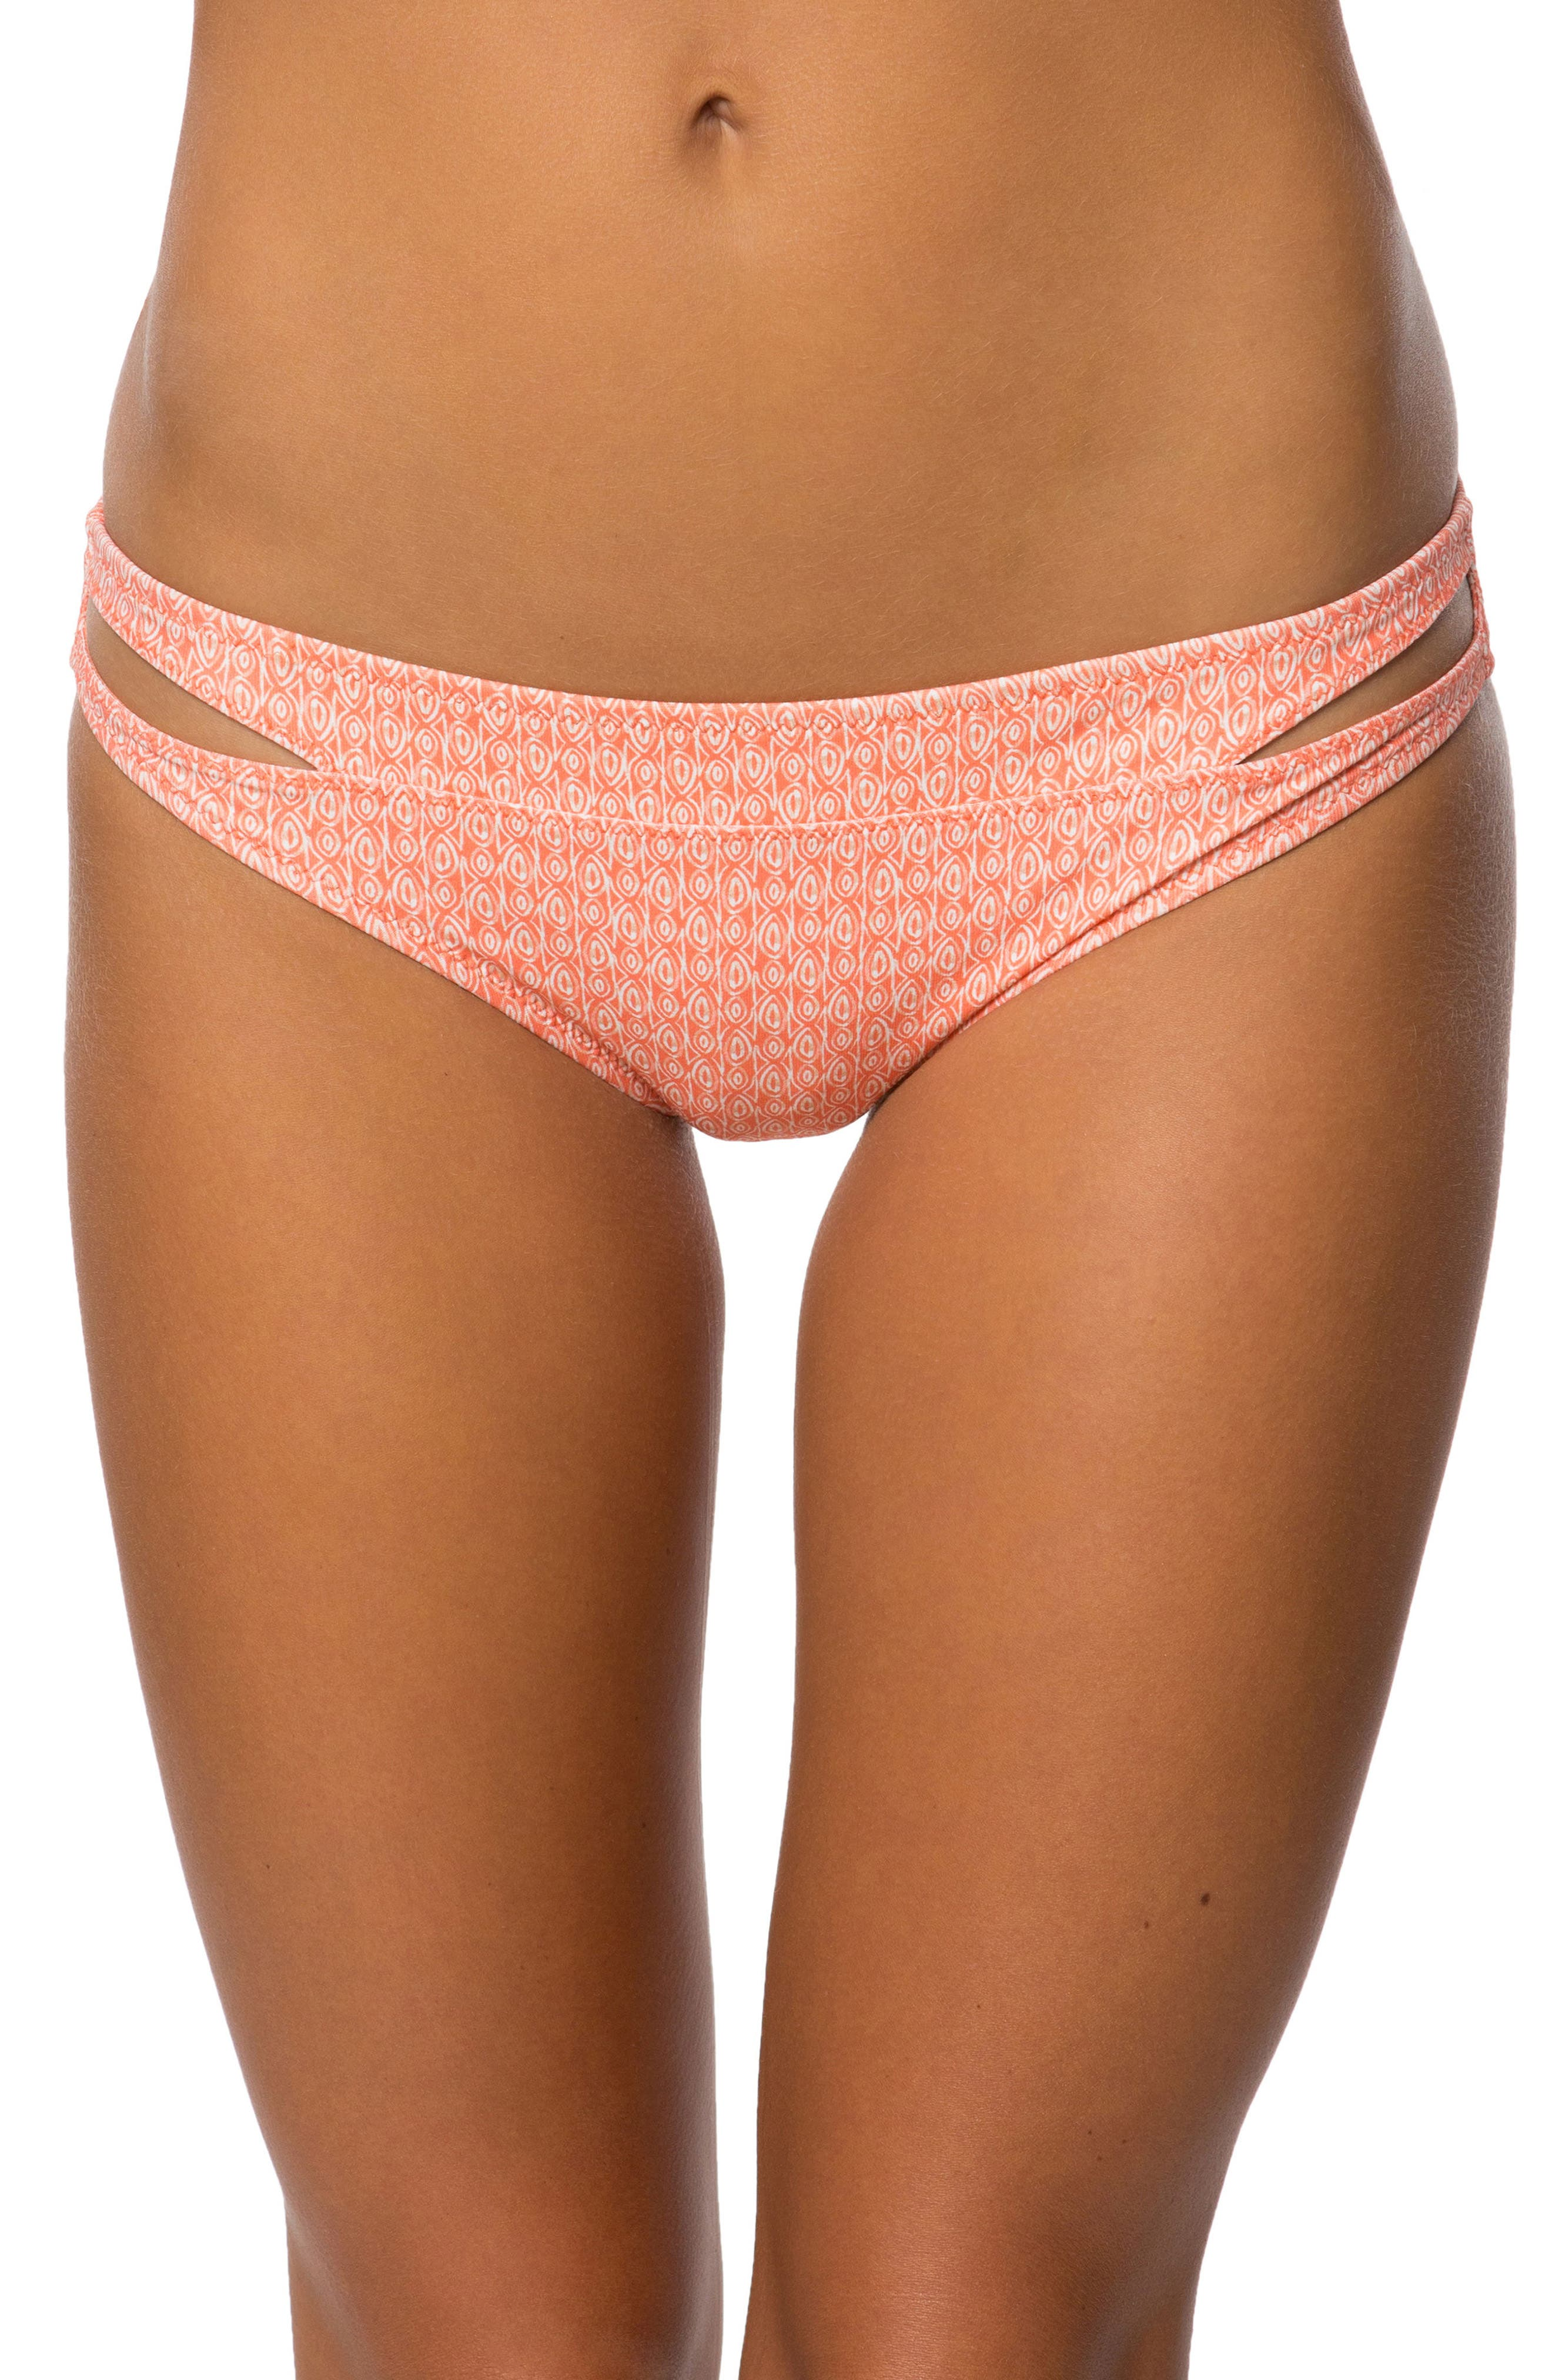 Tide Bikini Bottoms,                         Main,                         color, 950